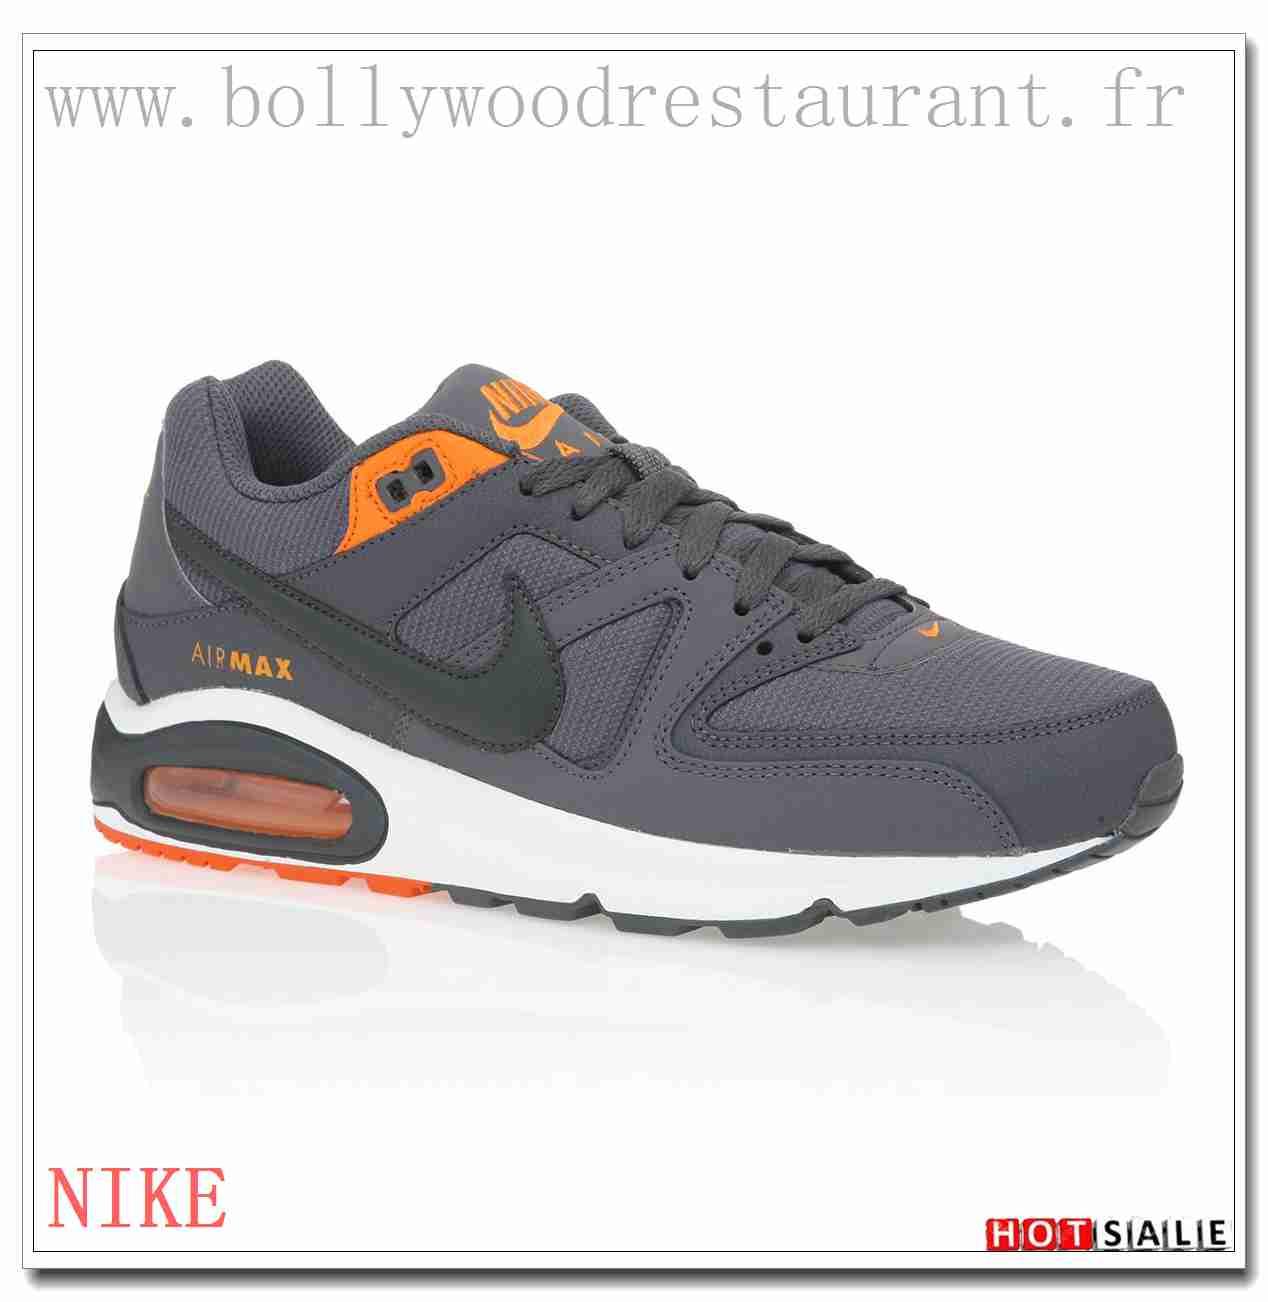 QK0716 Confortable Cool 2018 Nouveau style Nike Air Max 1 Homme